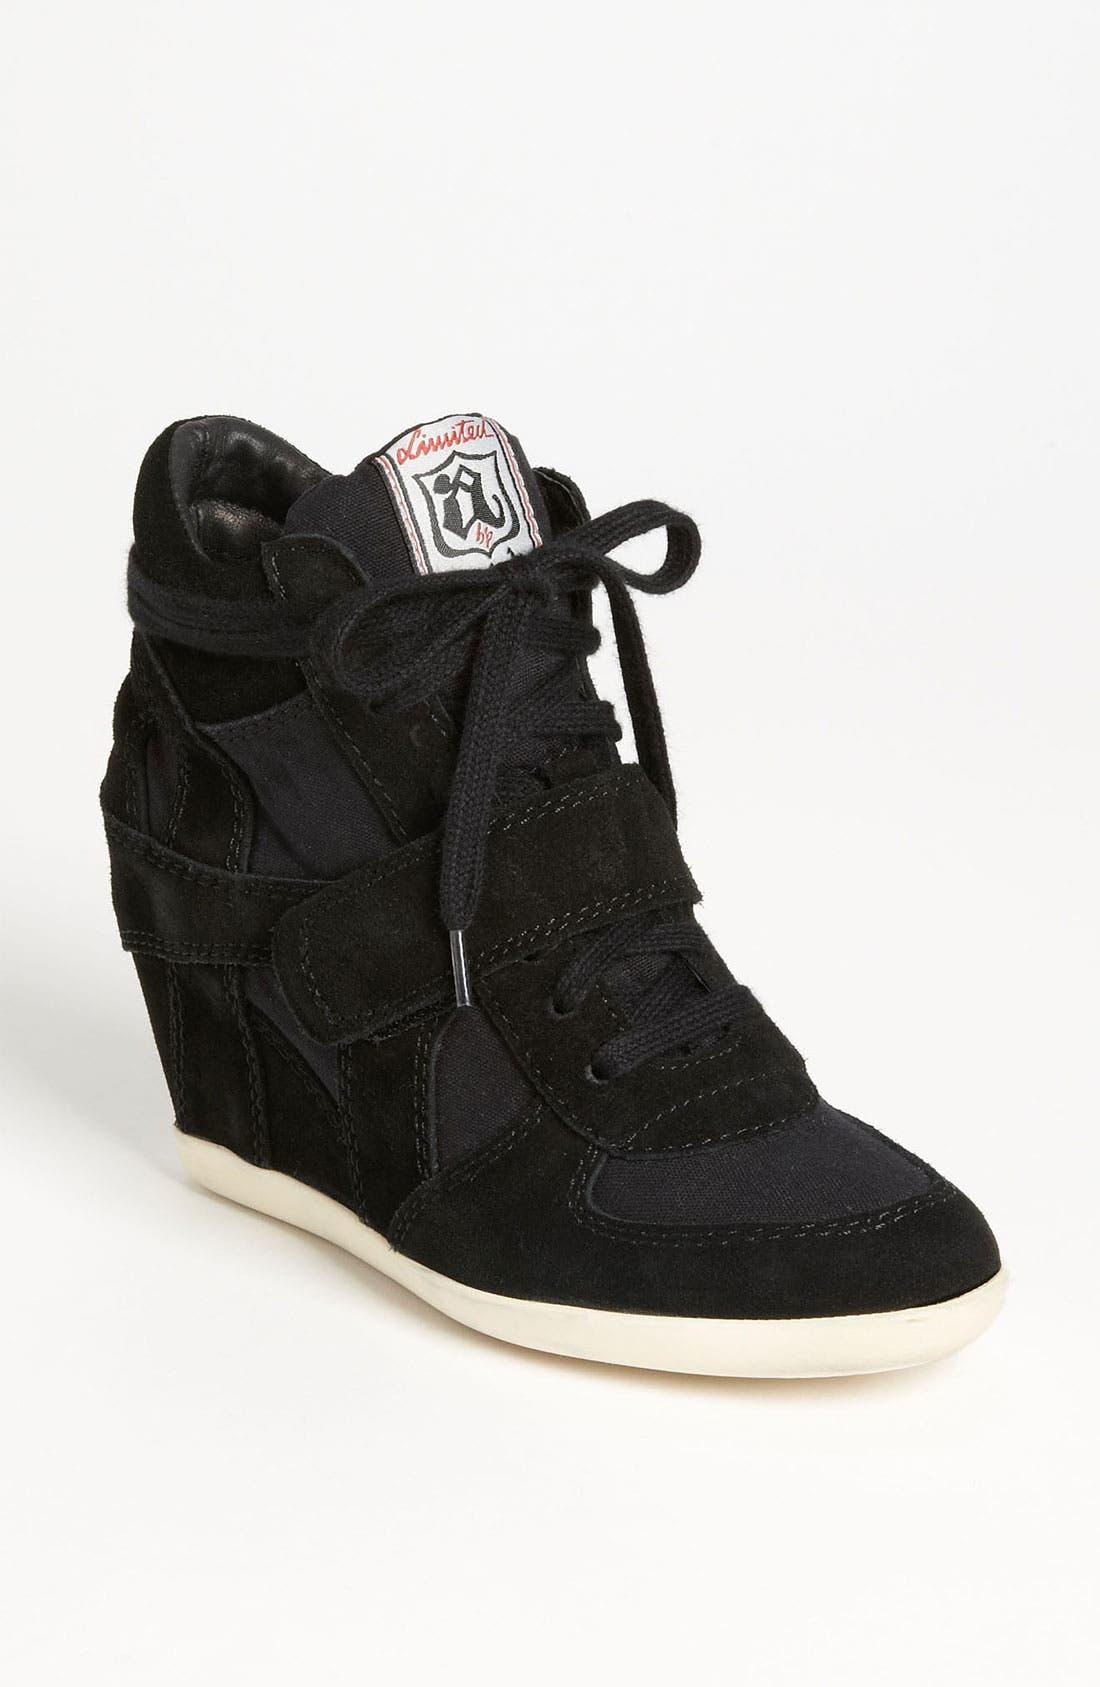 Main Image - Ash 'Bowie' Hidden Wedge Sneaker